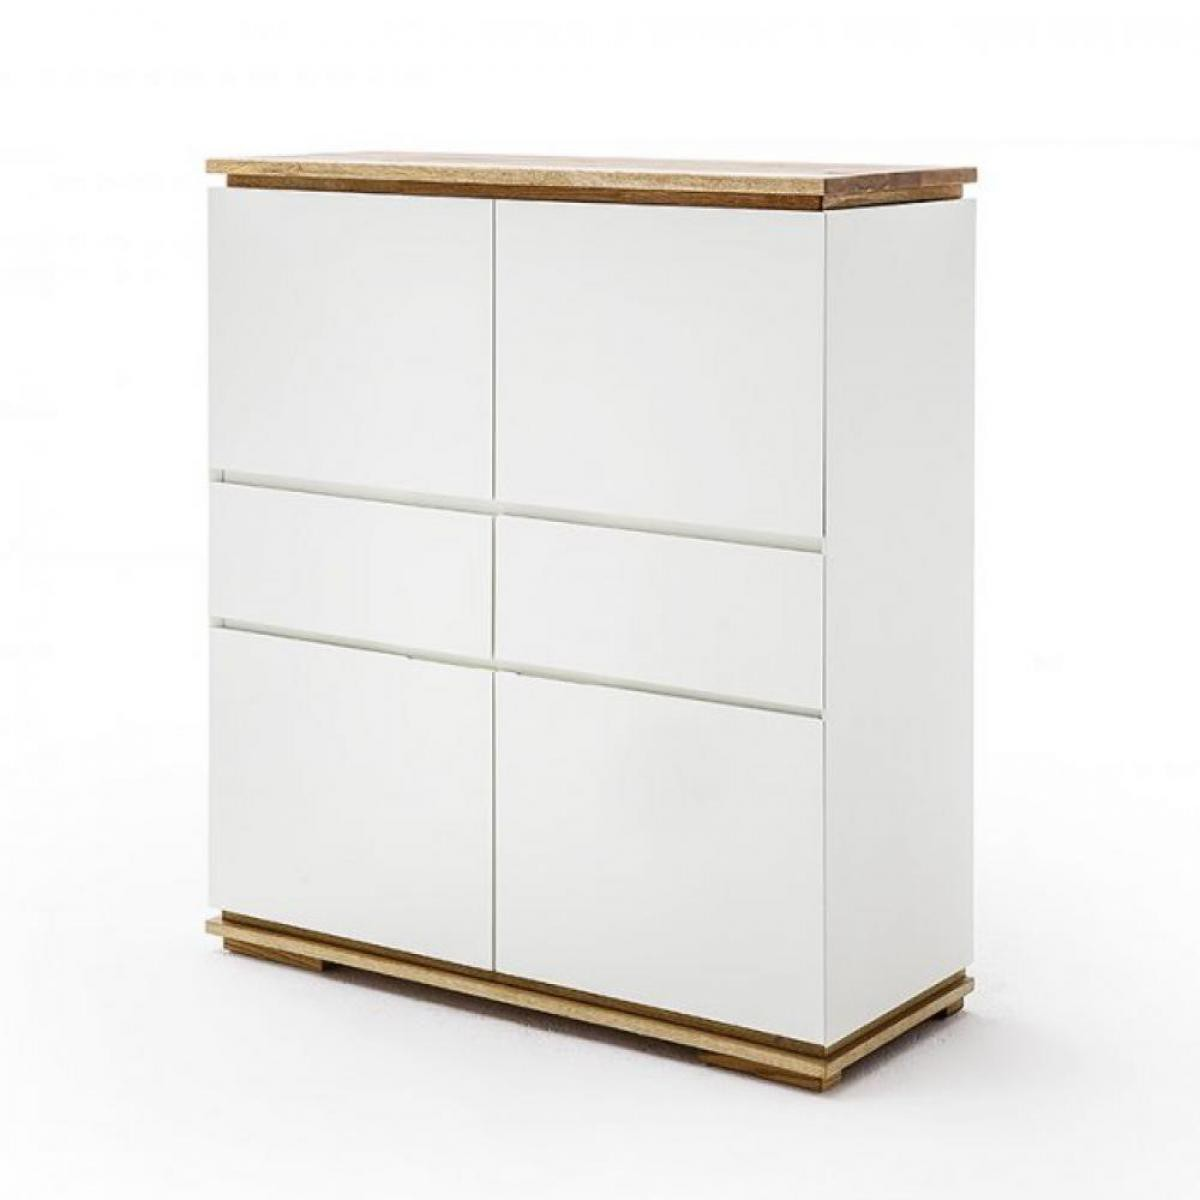 Inside 75 Buffet haut CHARLY 4 portes 2 tiroirs laqué blanc mat socle et plateau chêne massif